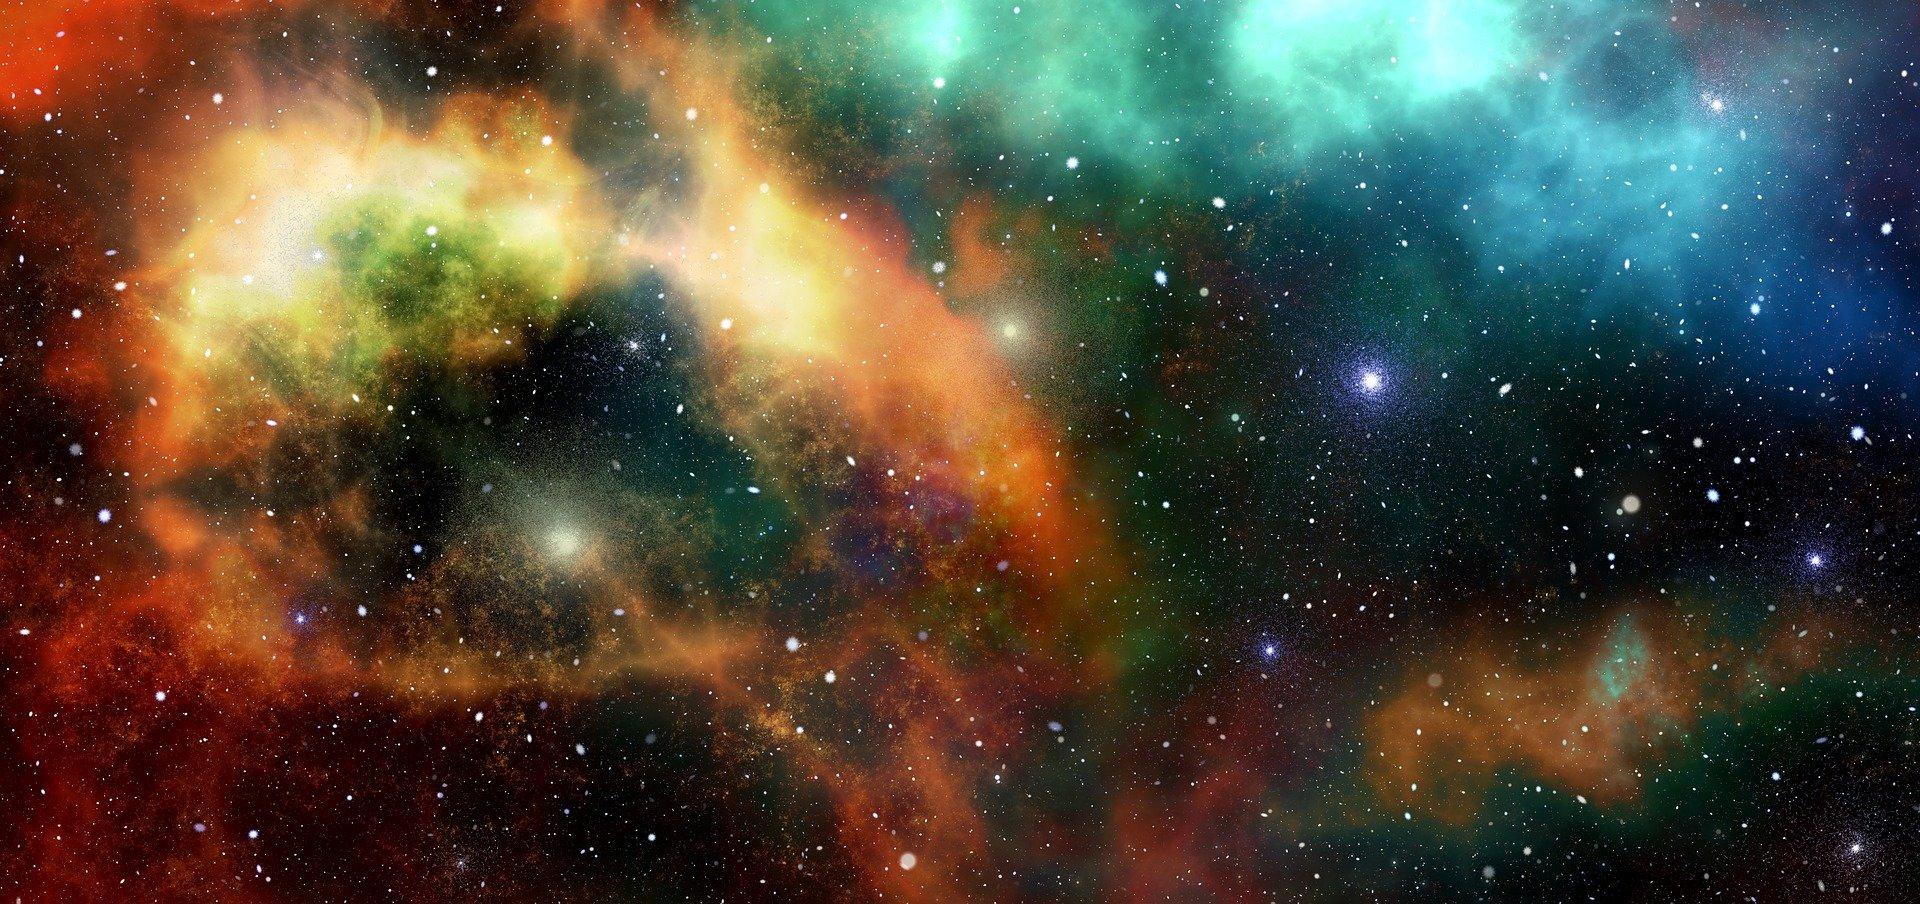 Astronomy vs Astrophysics vs Cosmology